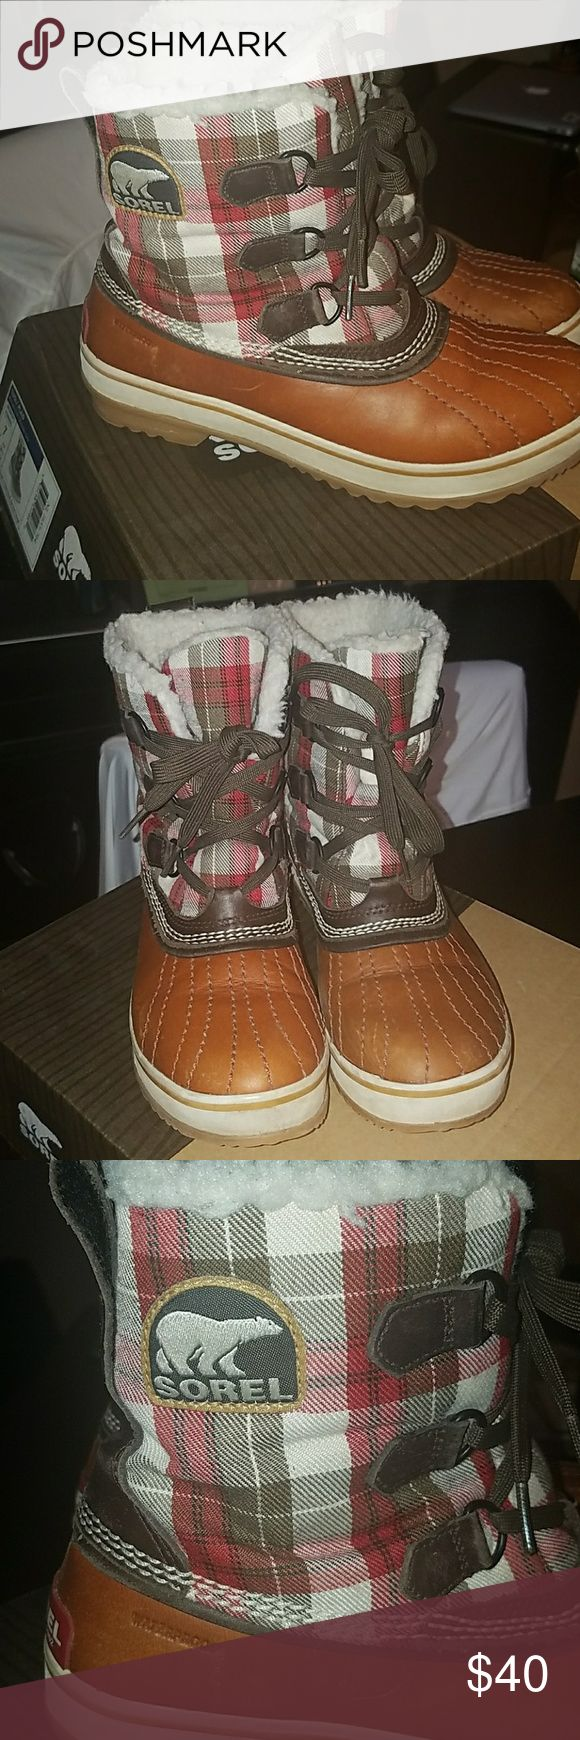 Sorel Snow boots Brown with plaid print snow boots Sorel Shoes Winter & Rain Boots